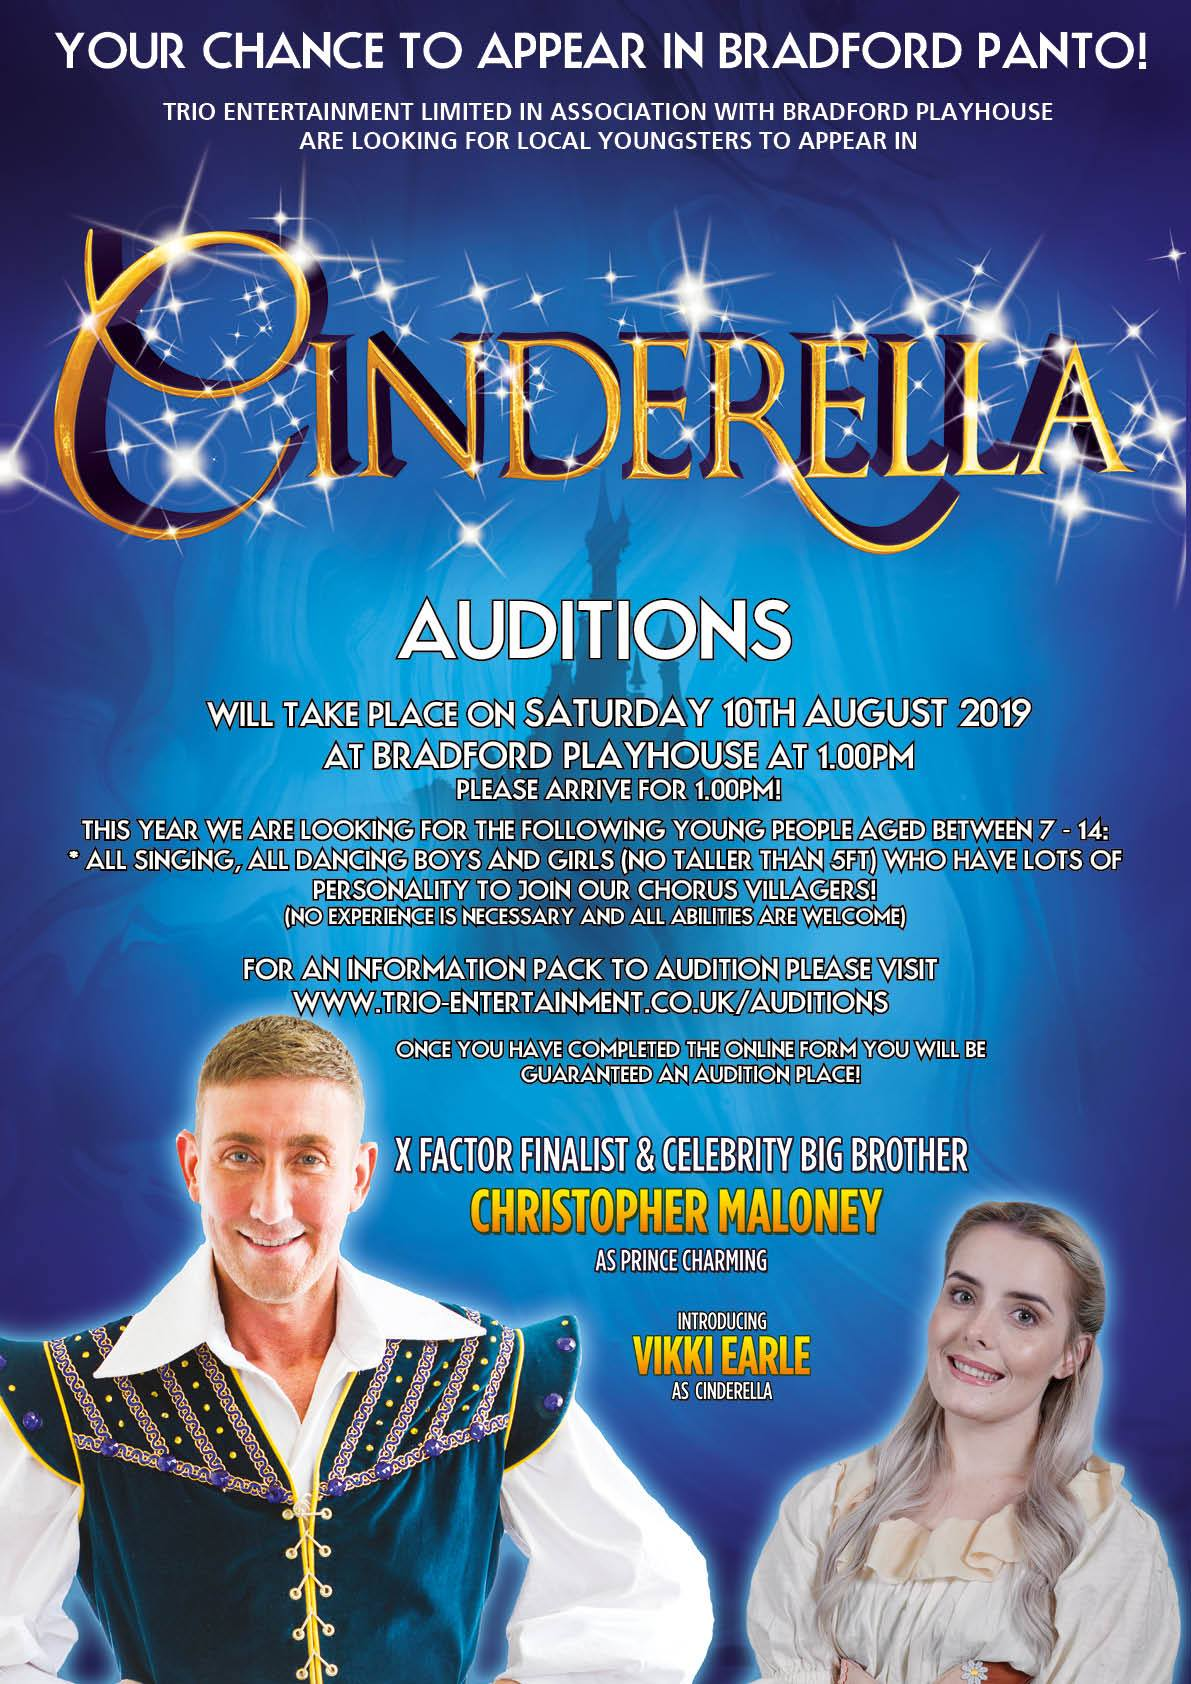 Cinderella - Bradford Auditions -